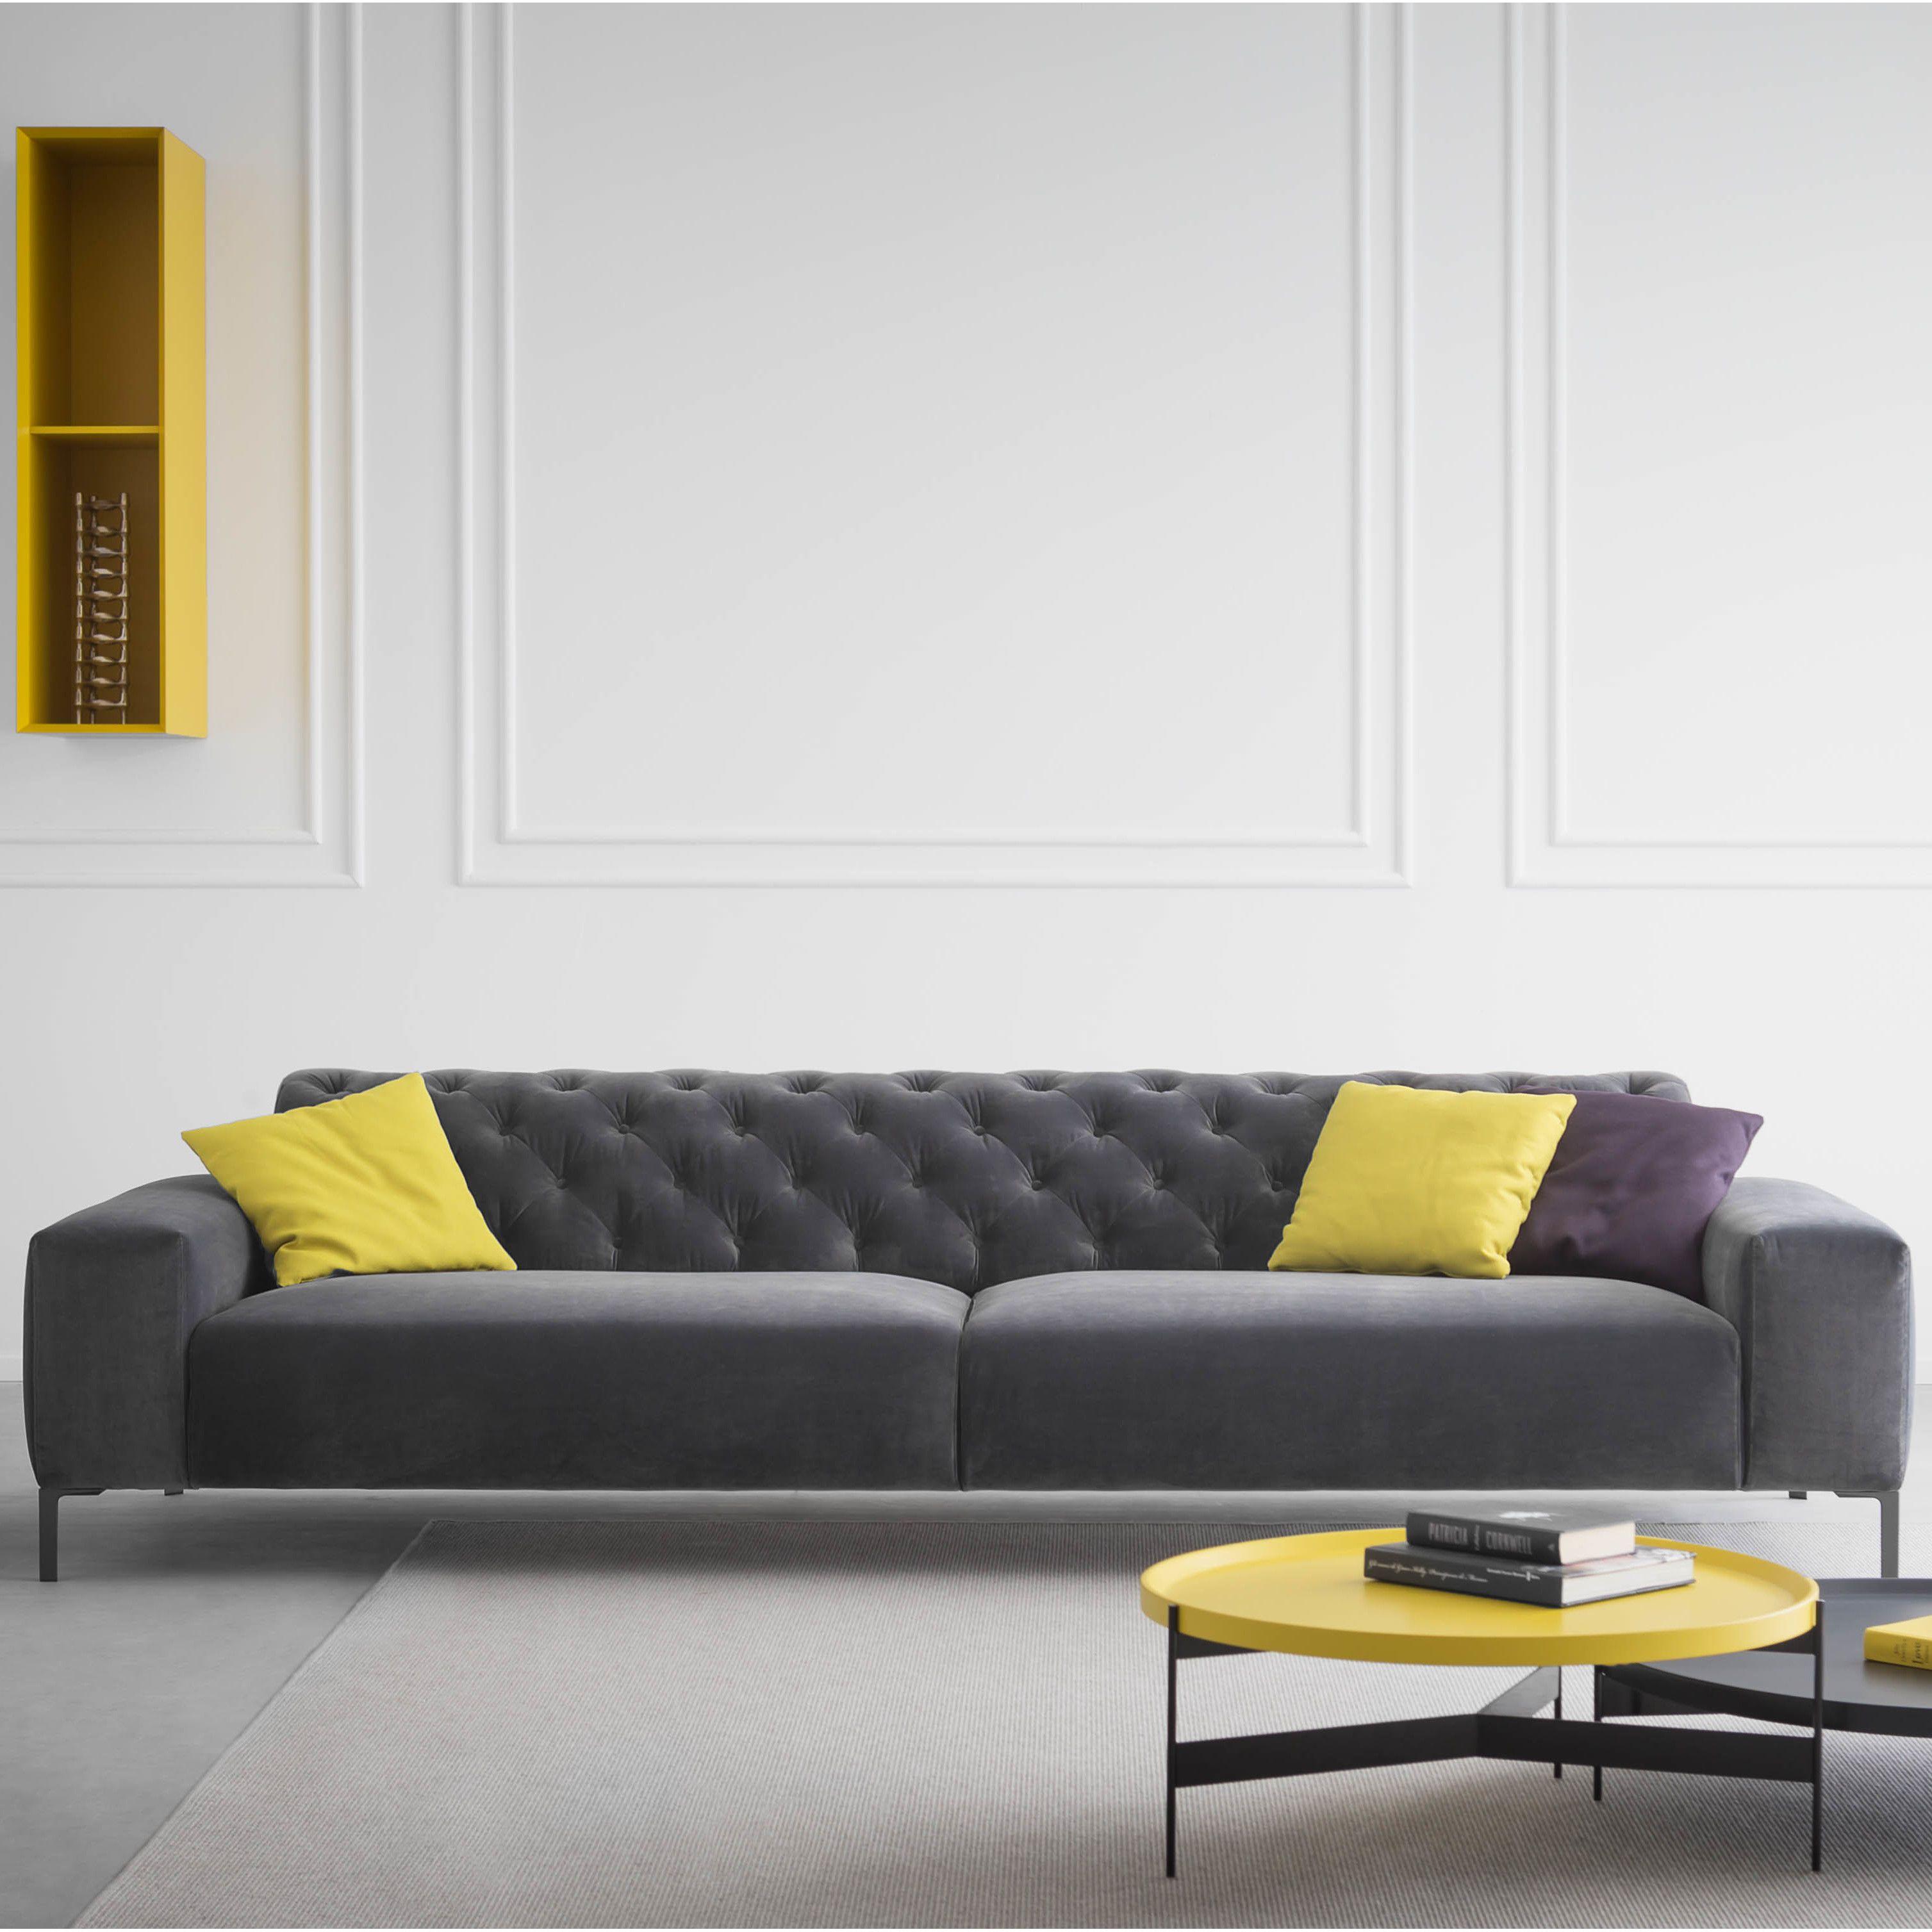 Good Mood Bonaldo Furniture